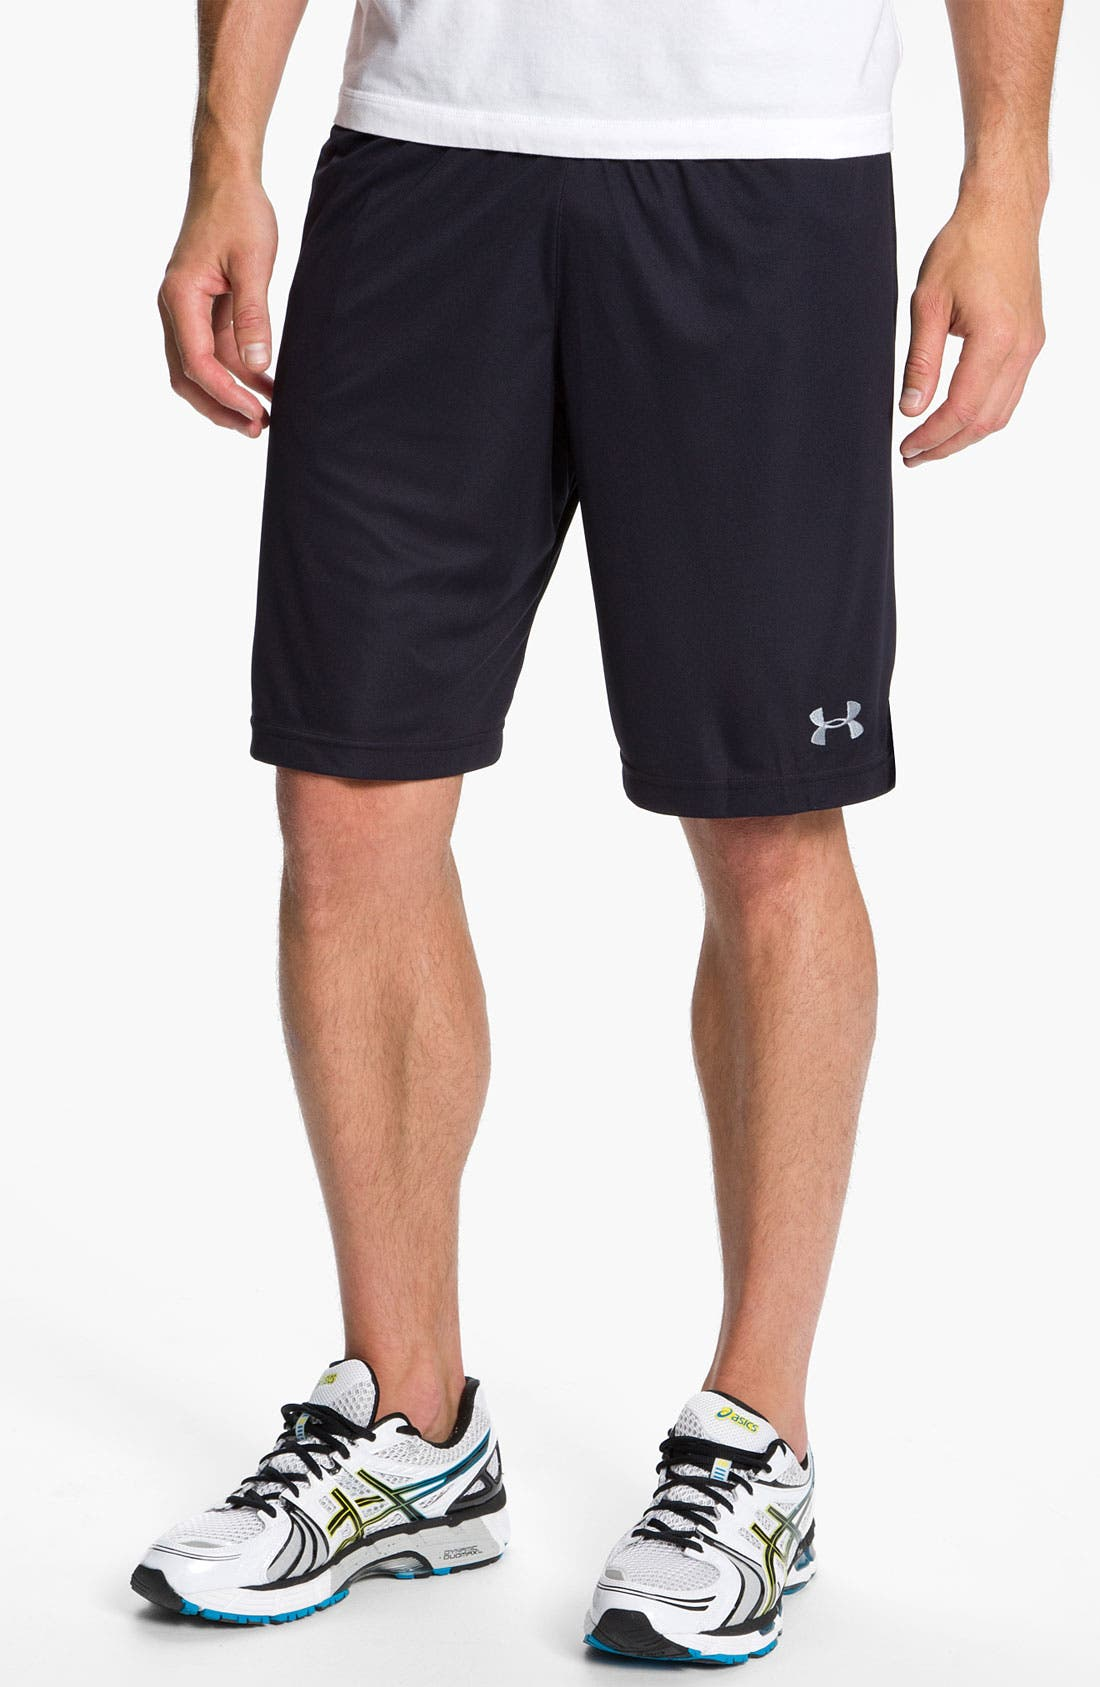 Main Image - Under Armour 'Revenant' Shorts